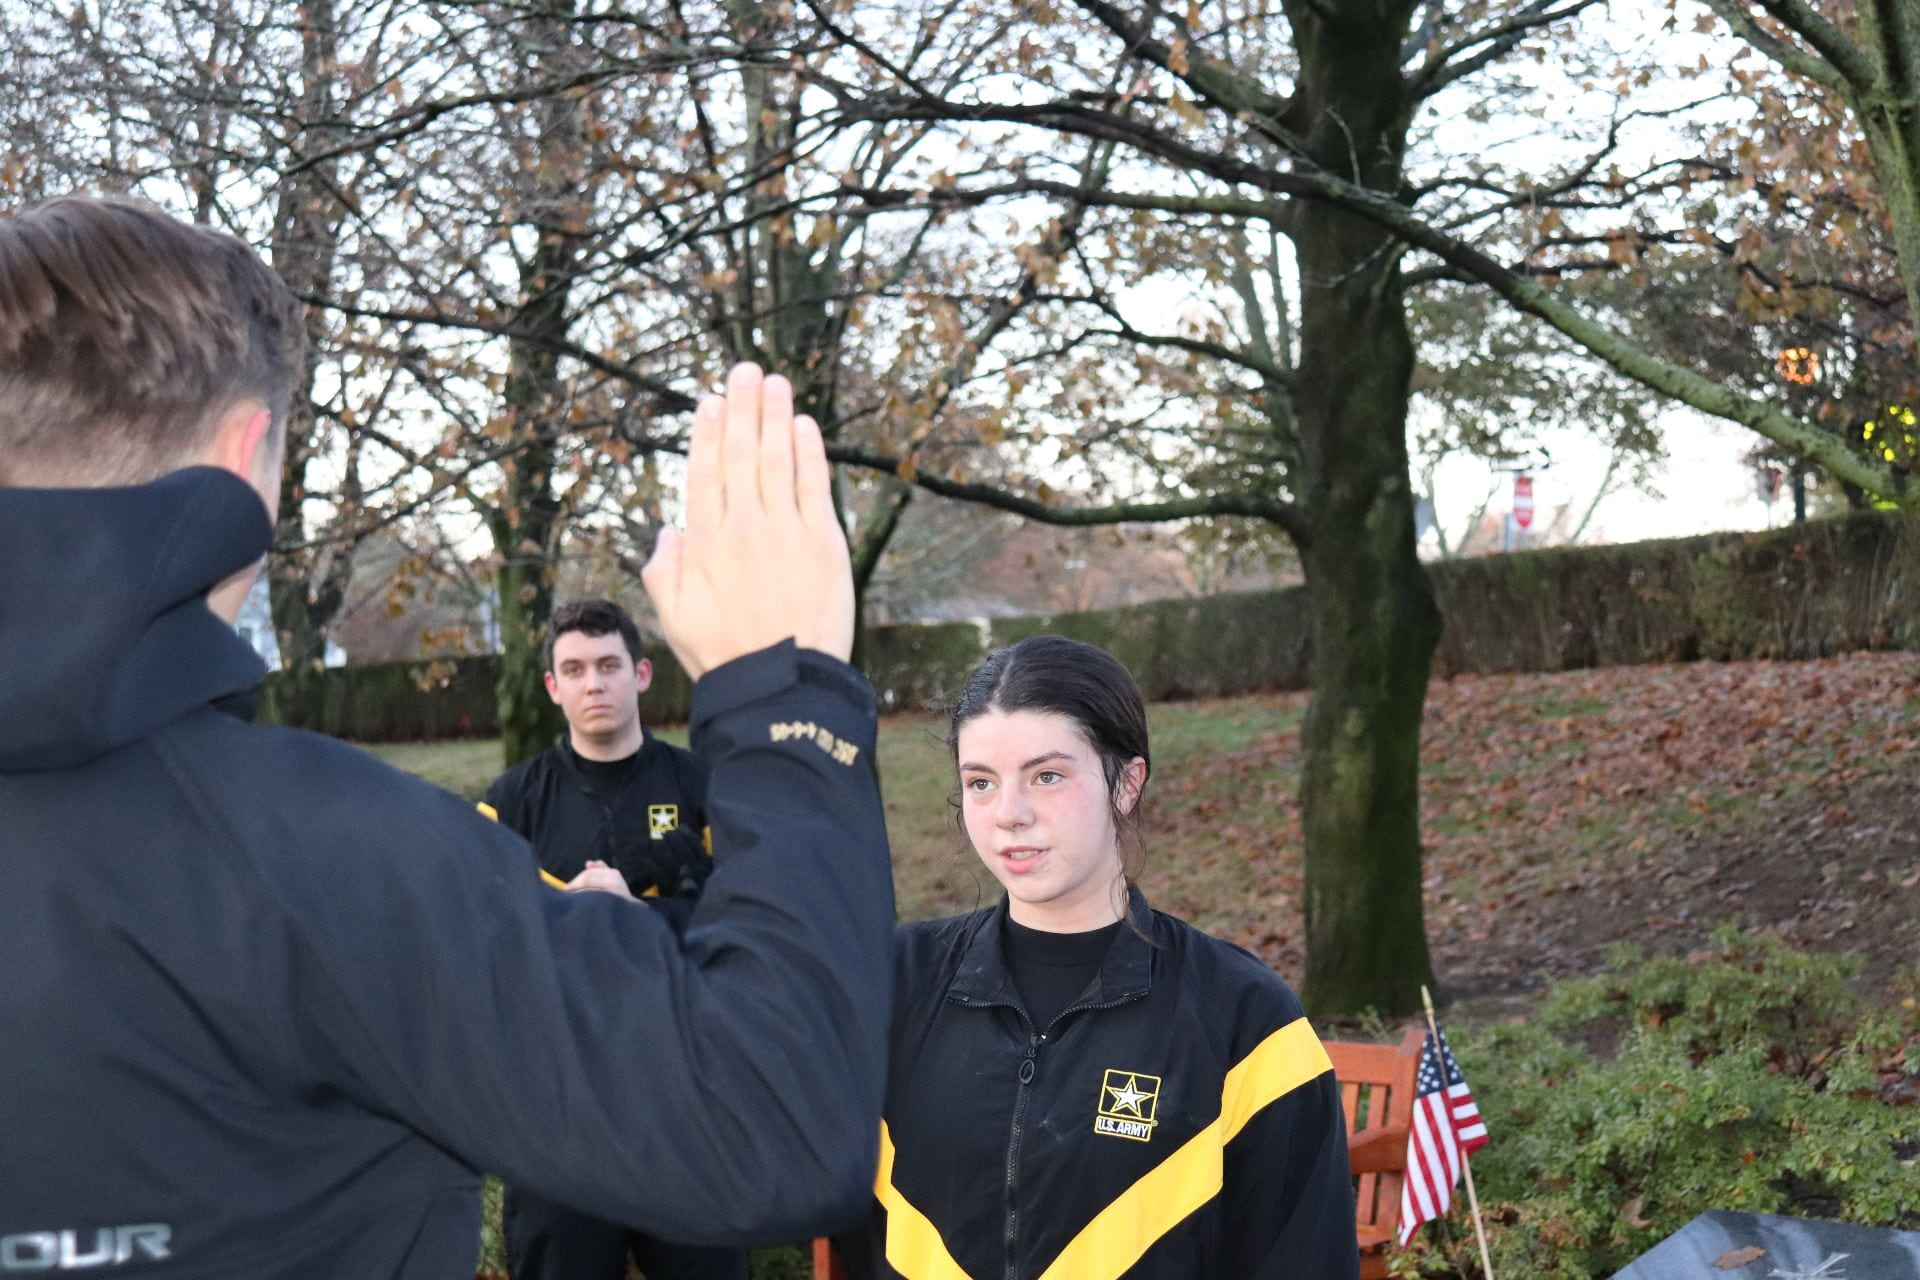 Contracting Cadet Cresci